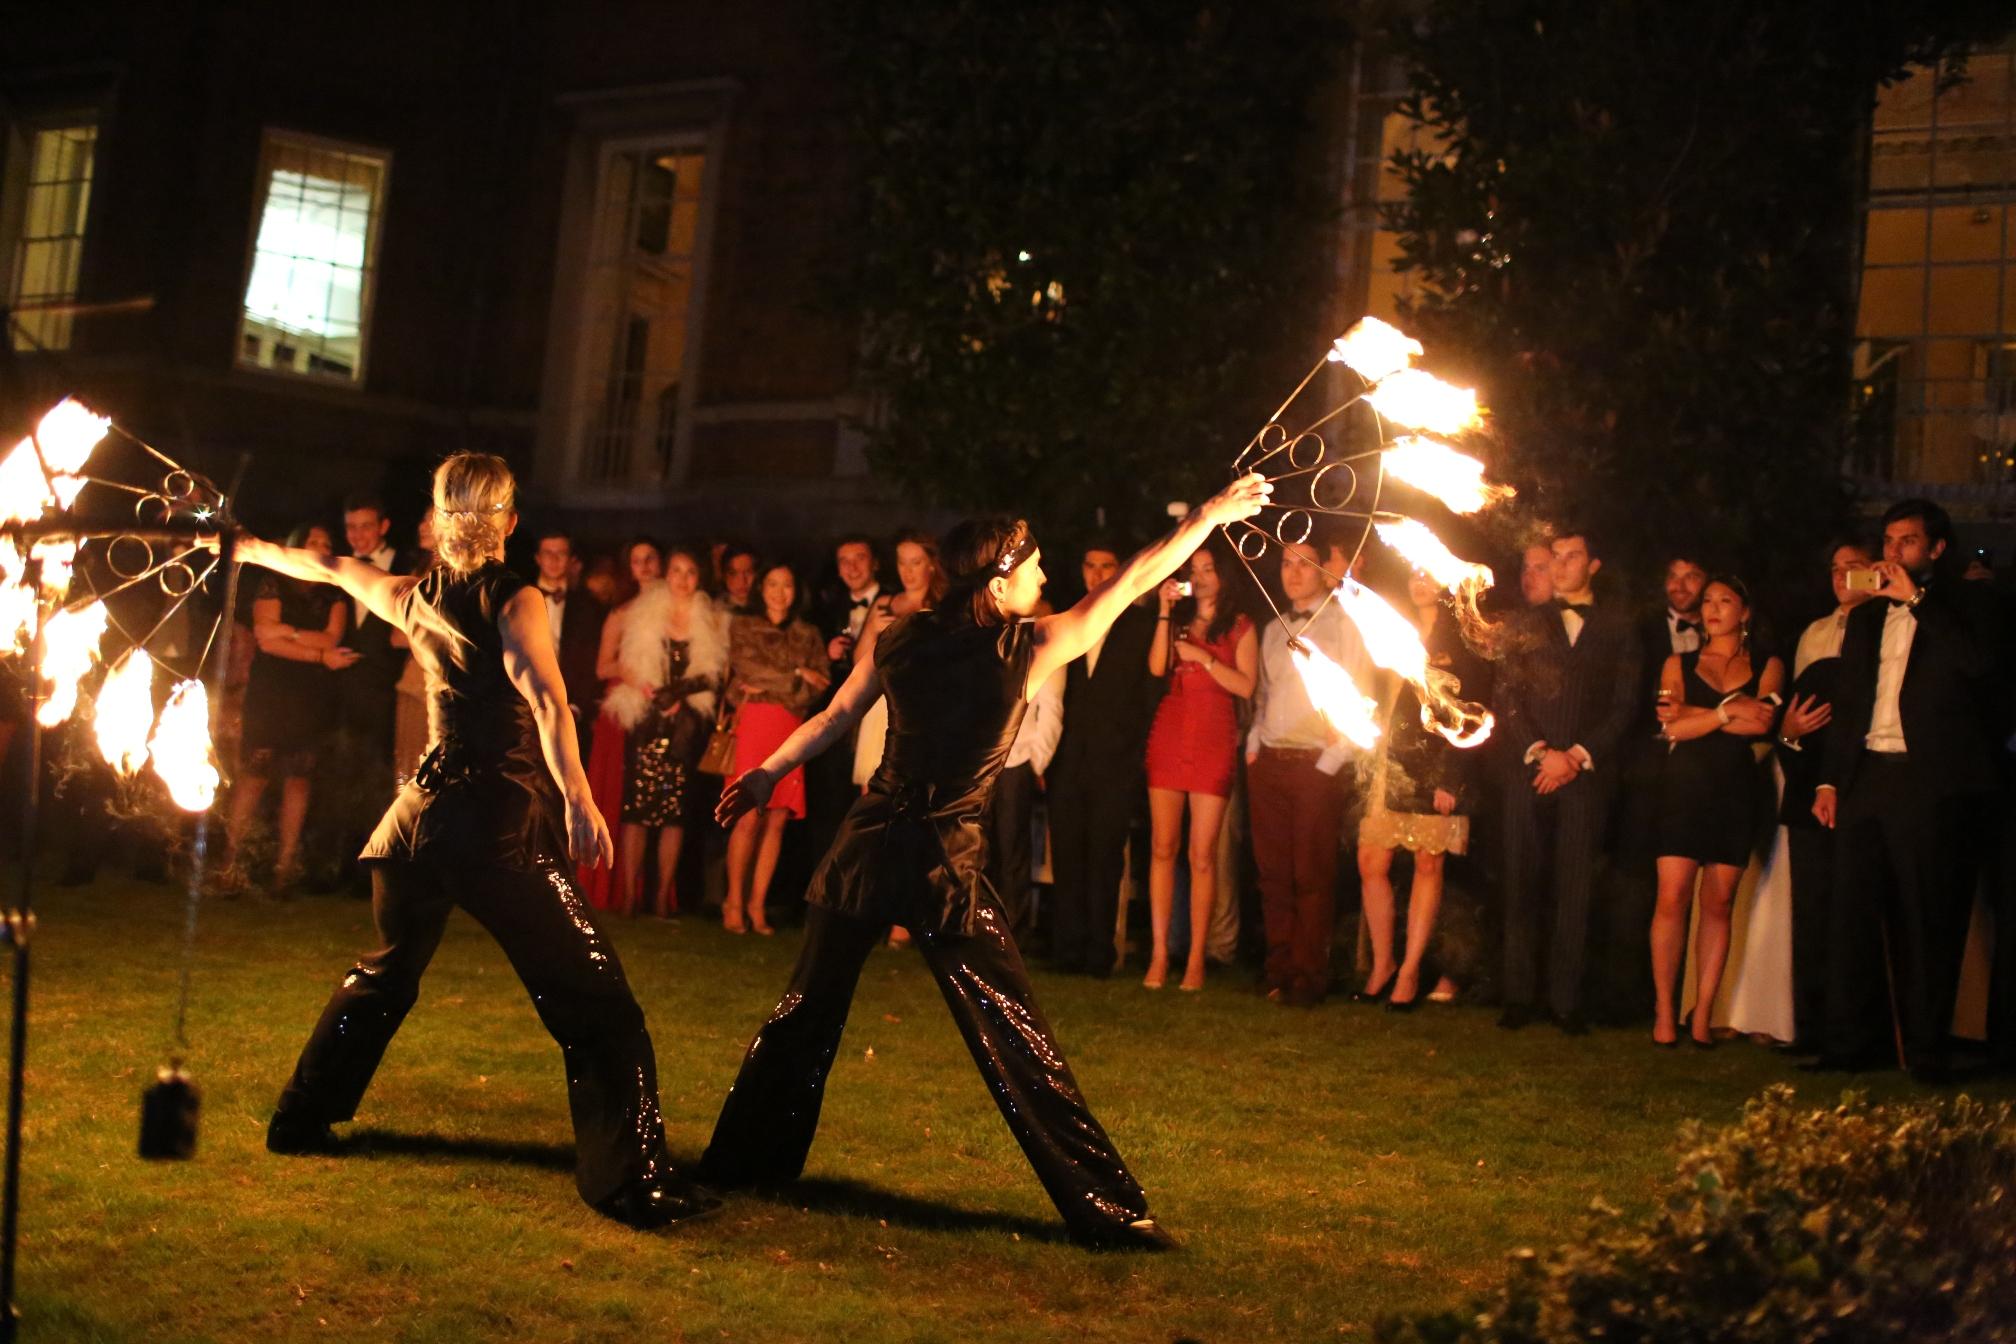 The Dream Fire Show